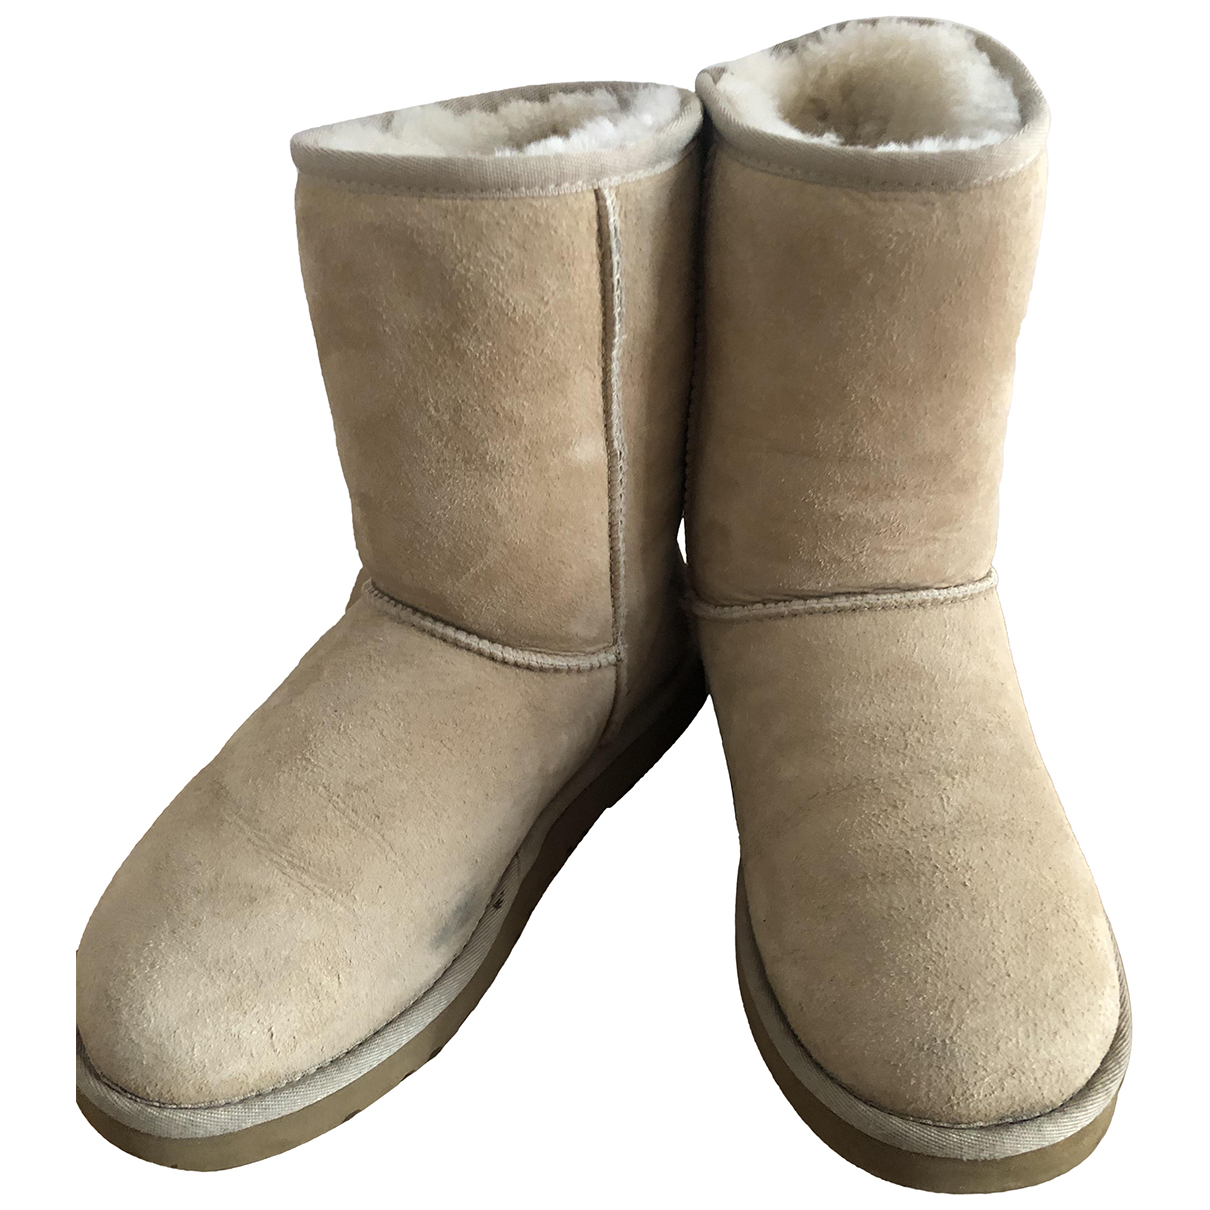 Ugg - Bottes   pour femme en mouton - beige